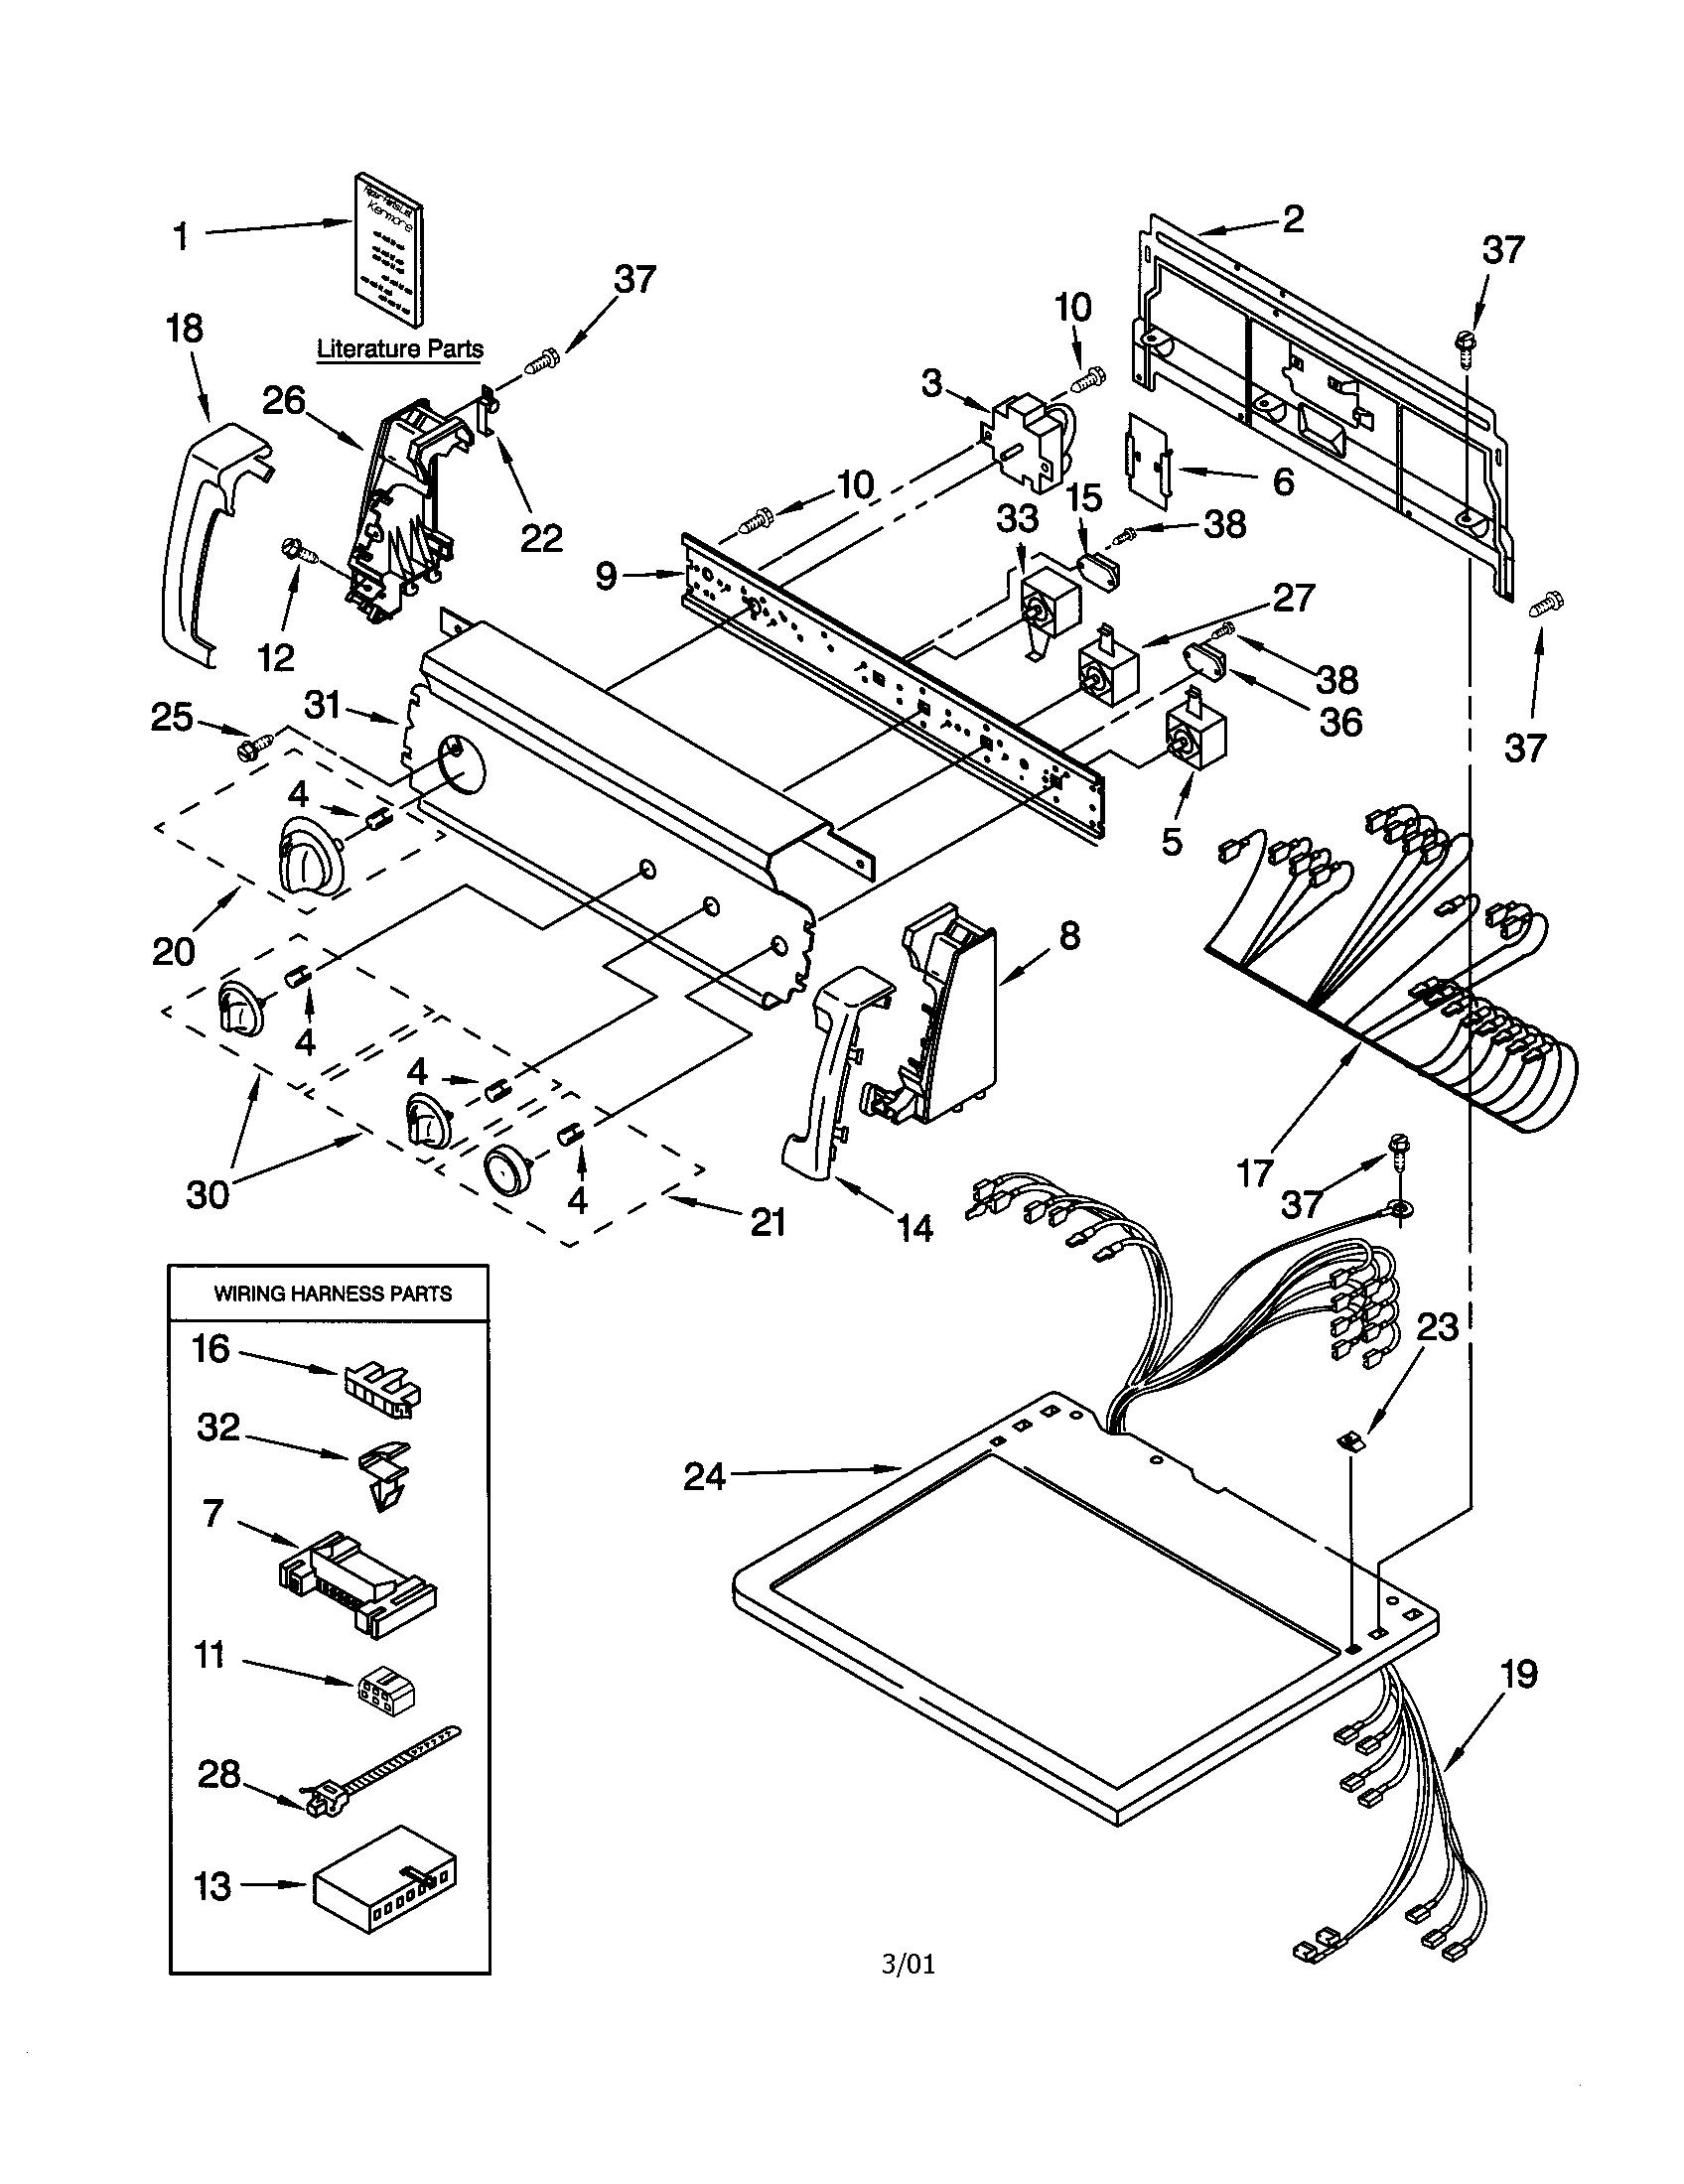 Kenmore 80 Series Washing Machine Pump Diagram Electrical Wiring Washer Parts On Elite He3 Imageresizertool Com 110 Agitator For